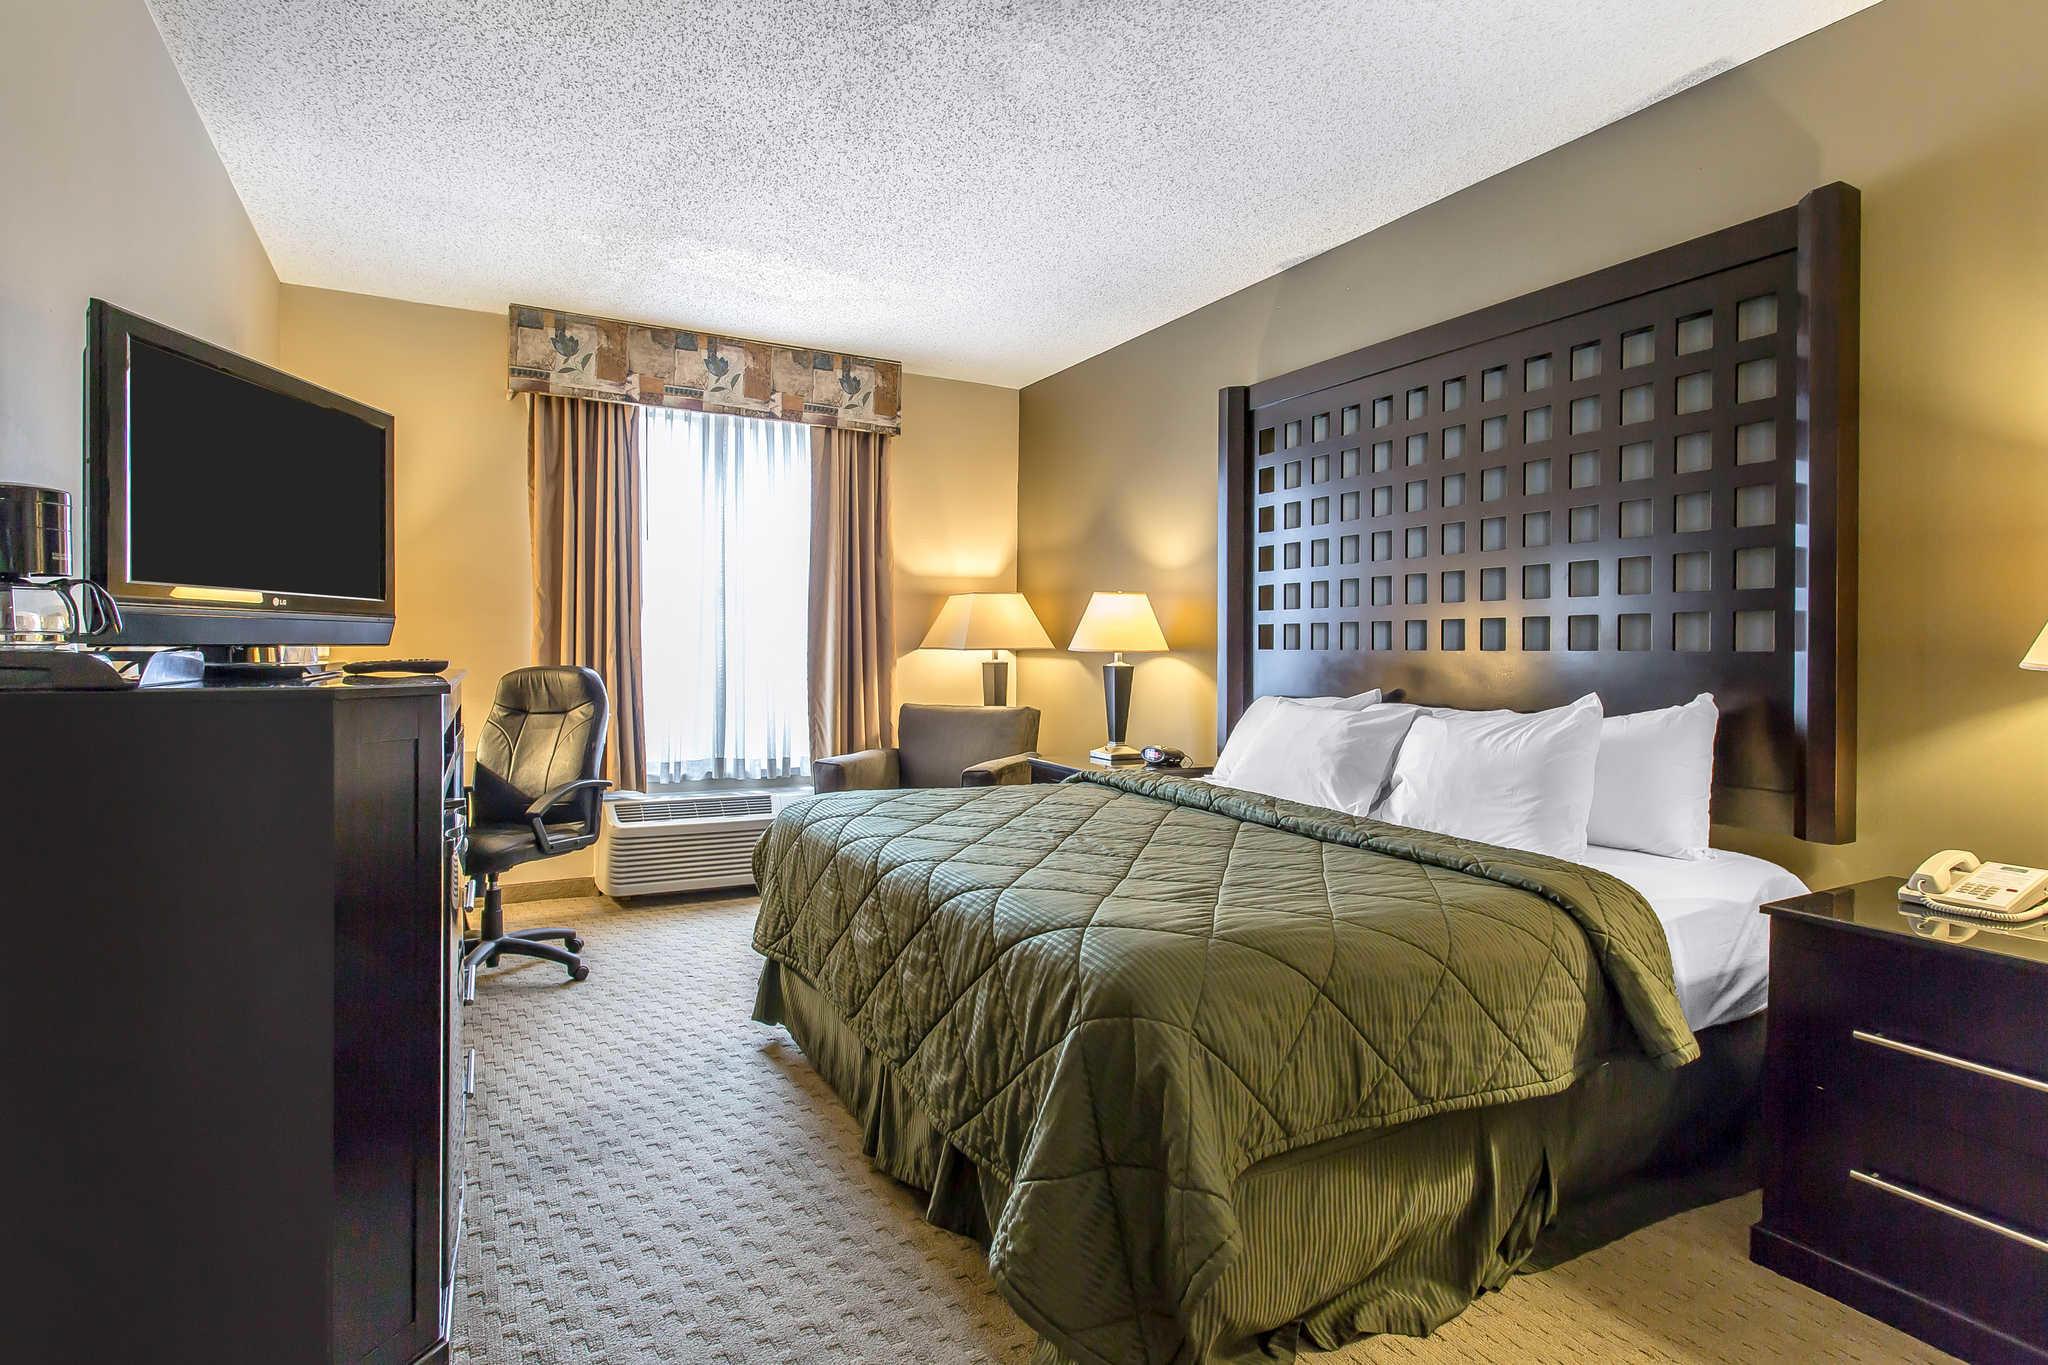 Quality Inn & Suites Durant image 10